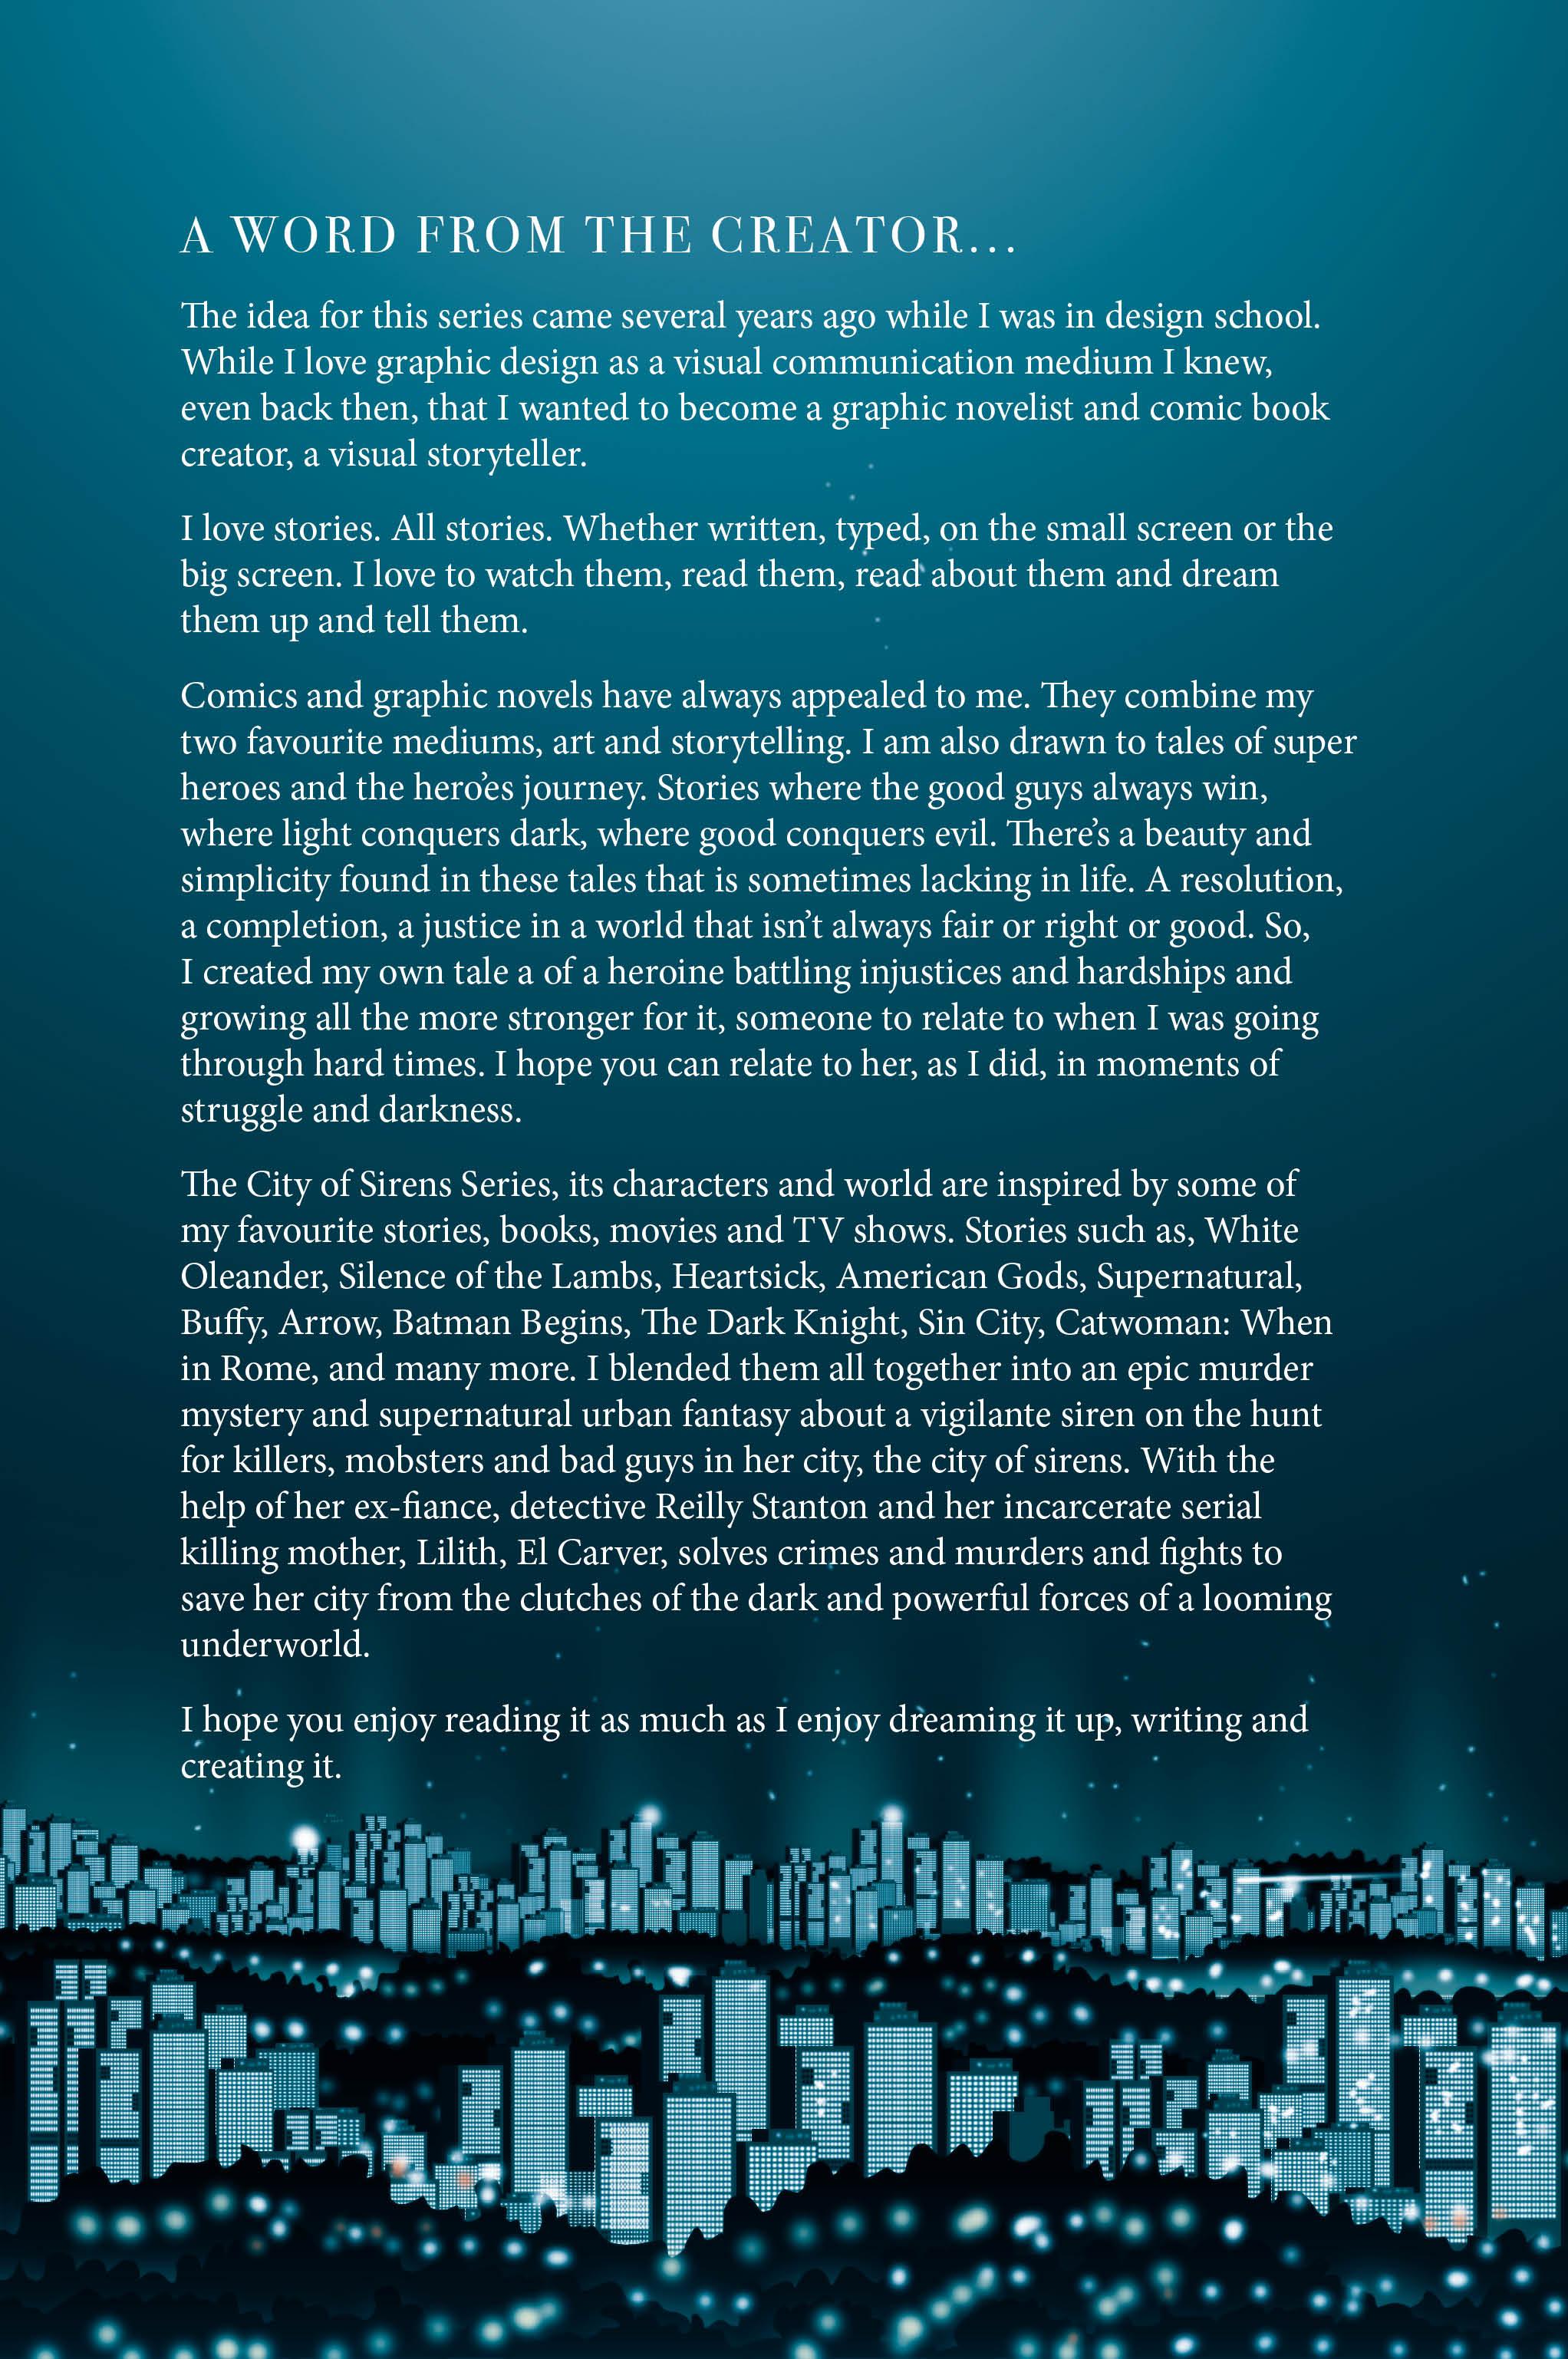 Siren-city-book-one (1)5.jpg